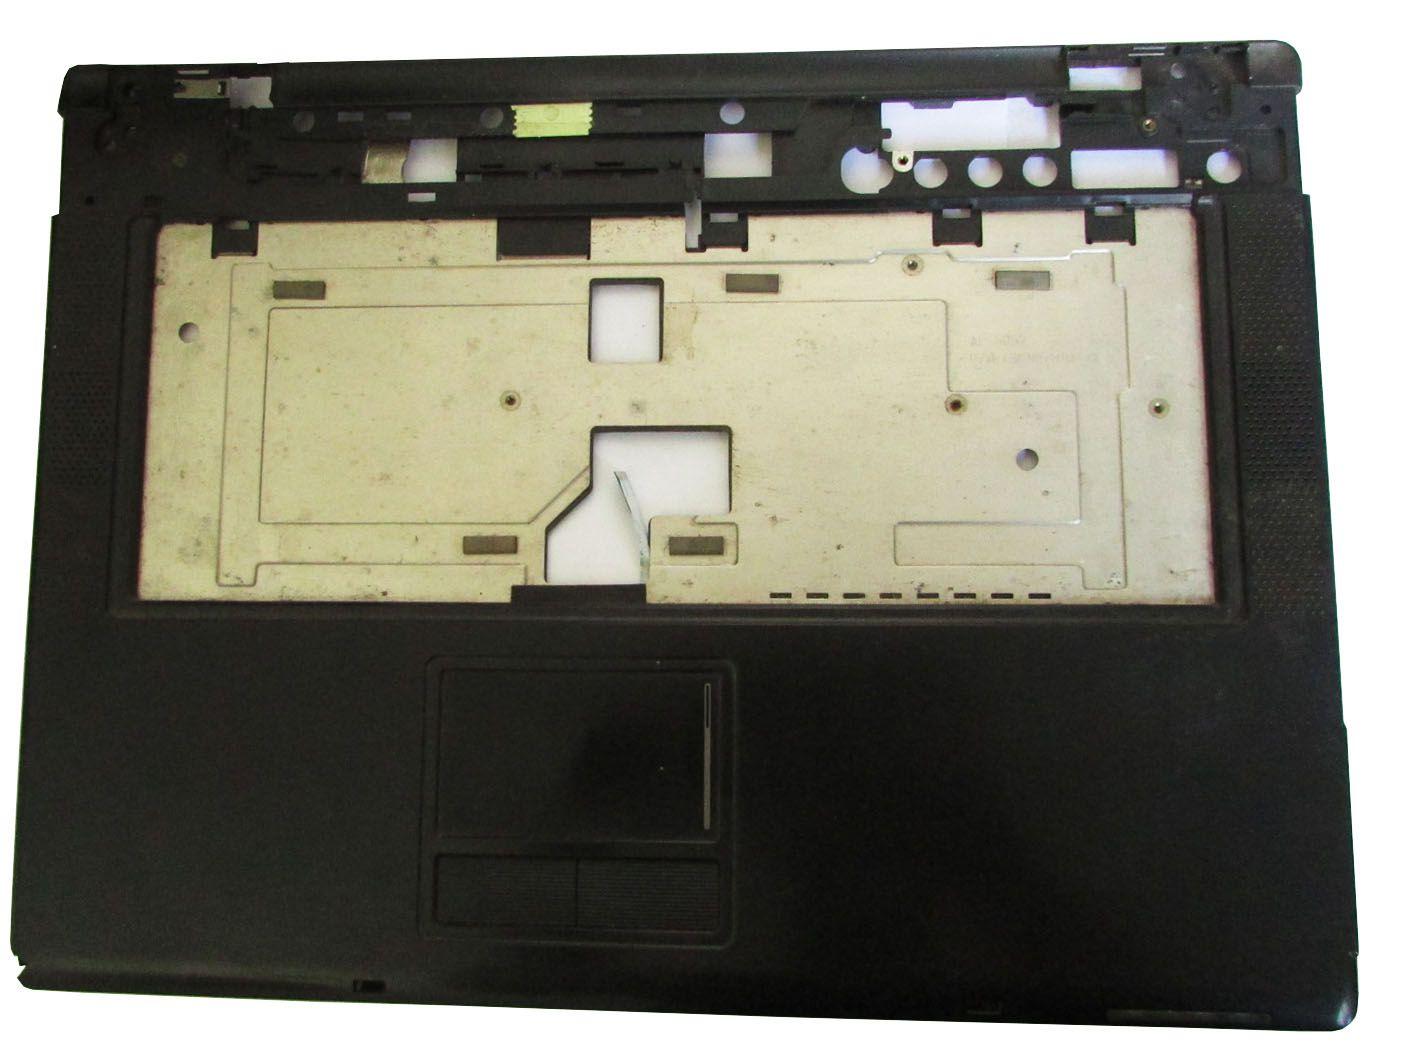 Carcaça Base Teclado Notebook Asus Z96 P/N: 13GNI57AP021-2 (semi novo)